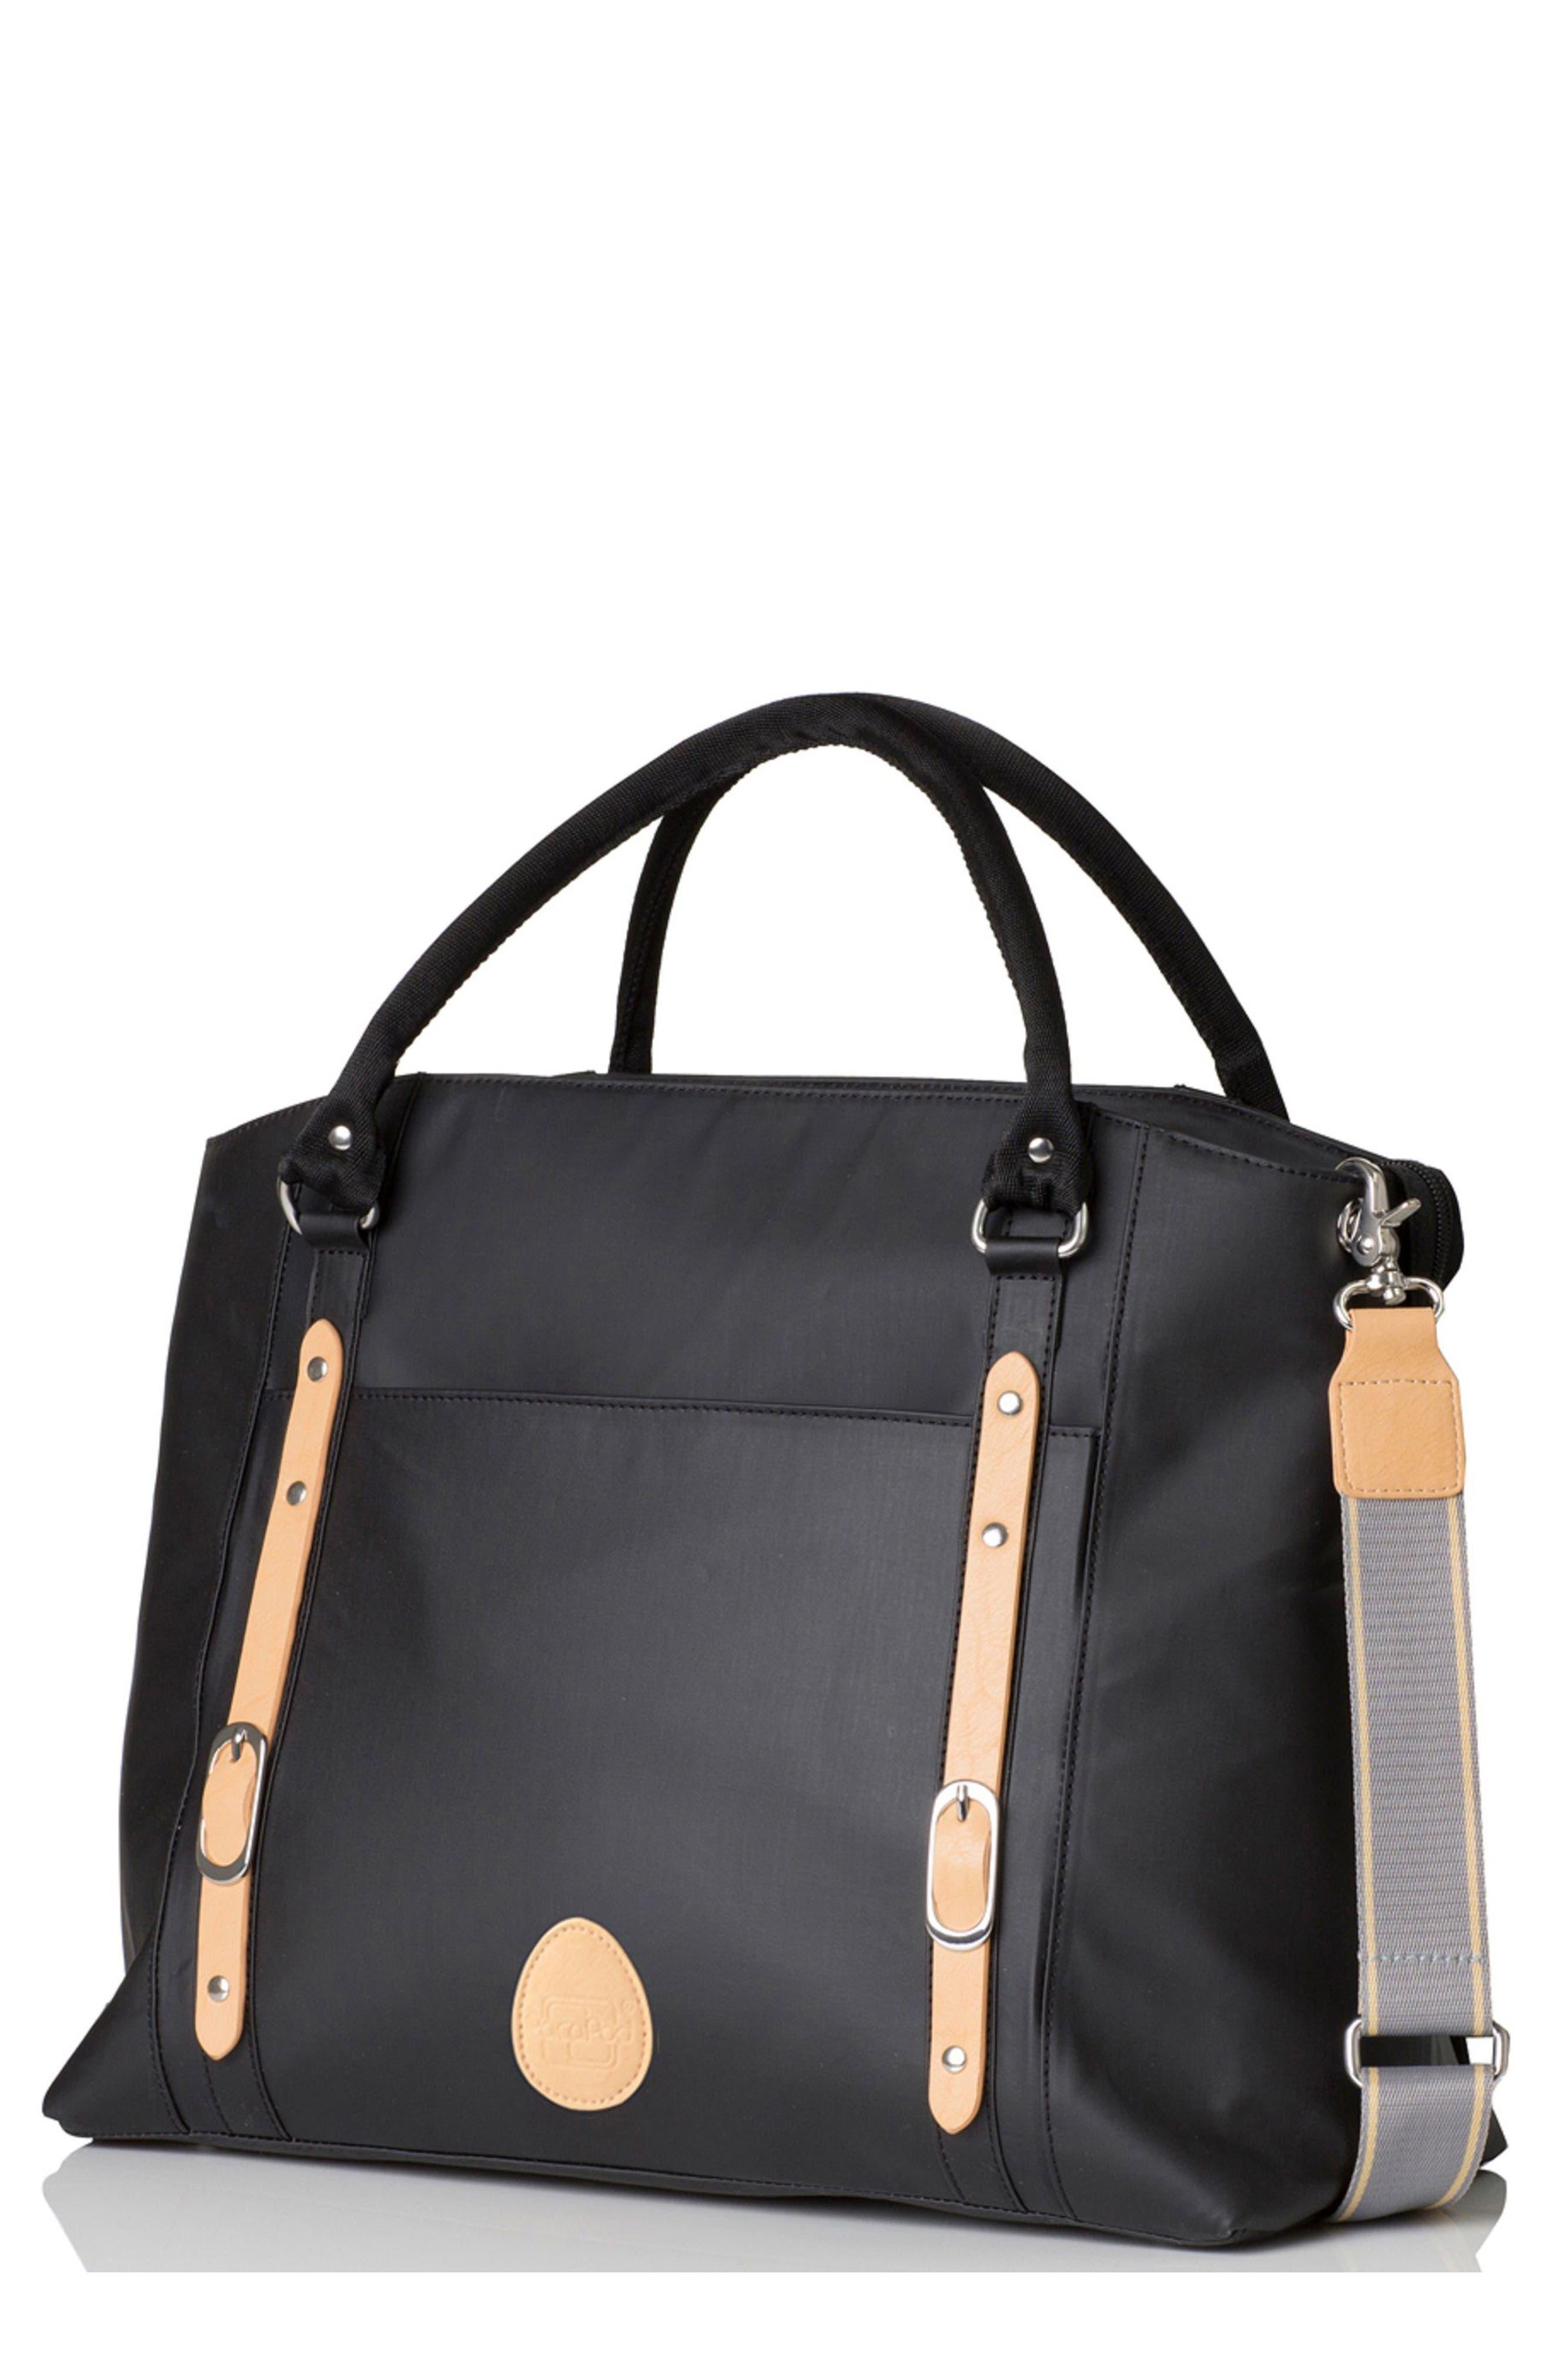 'Mirano' Diaper Bag,                         Main,                         color, Black